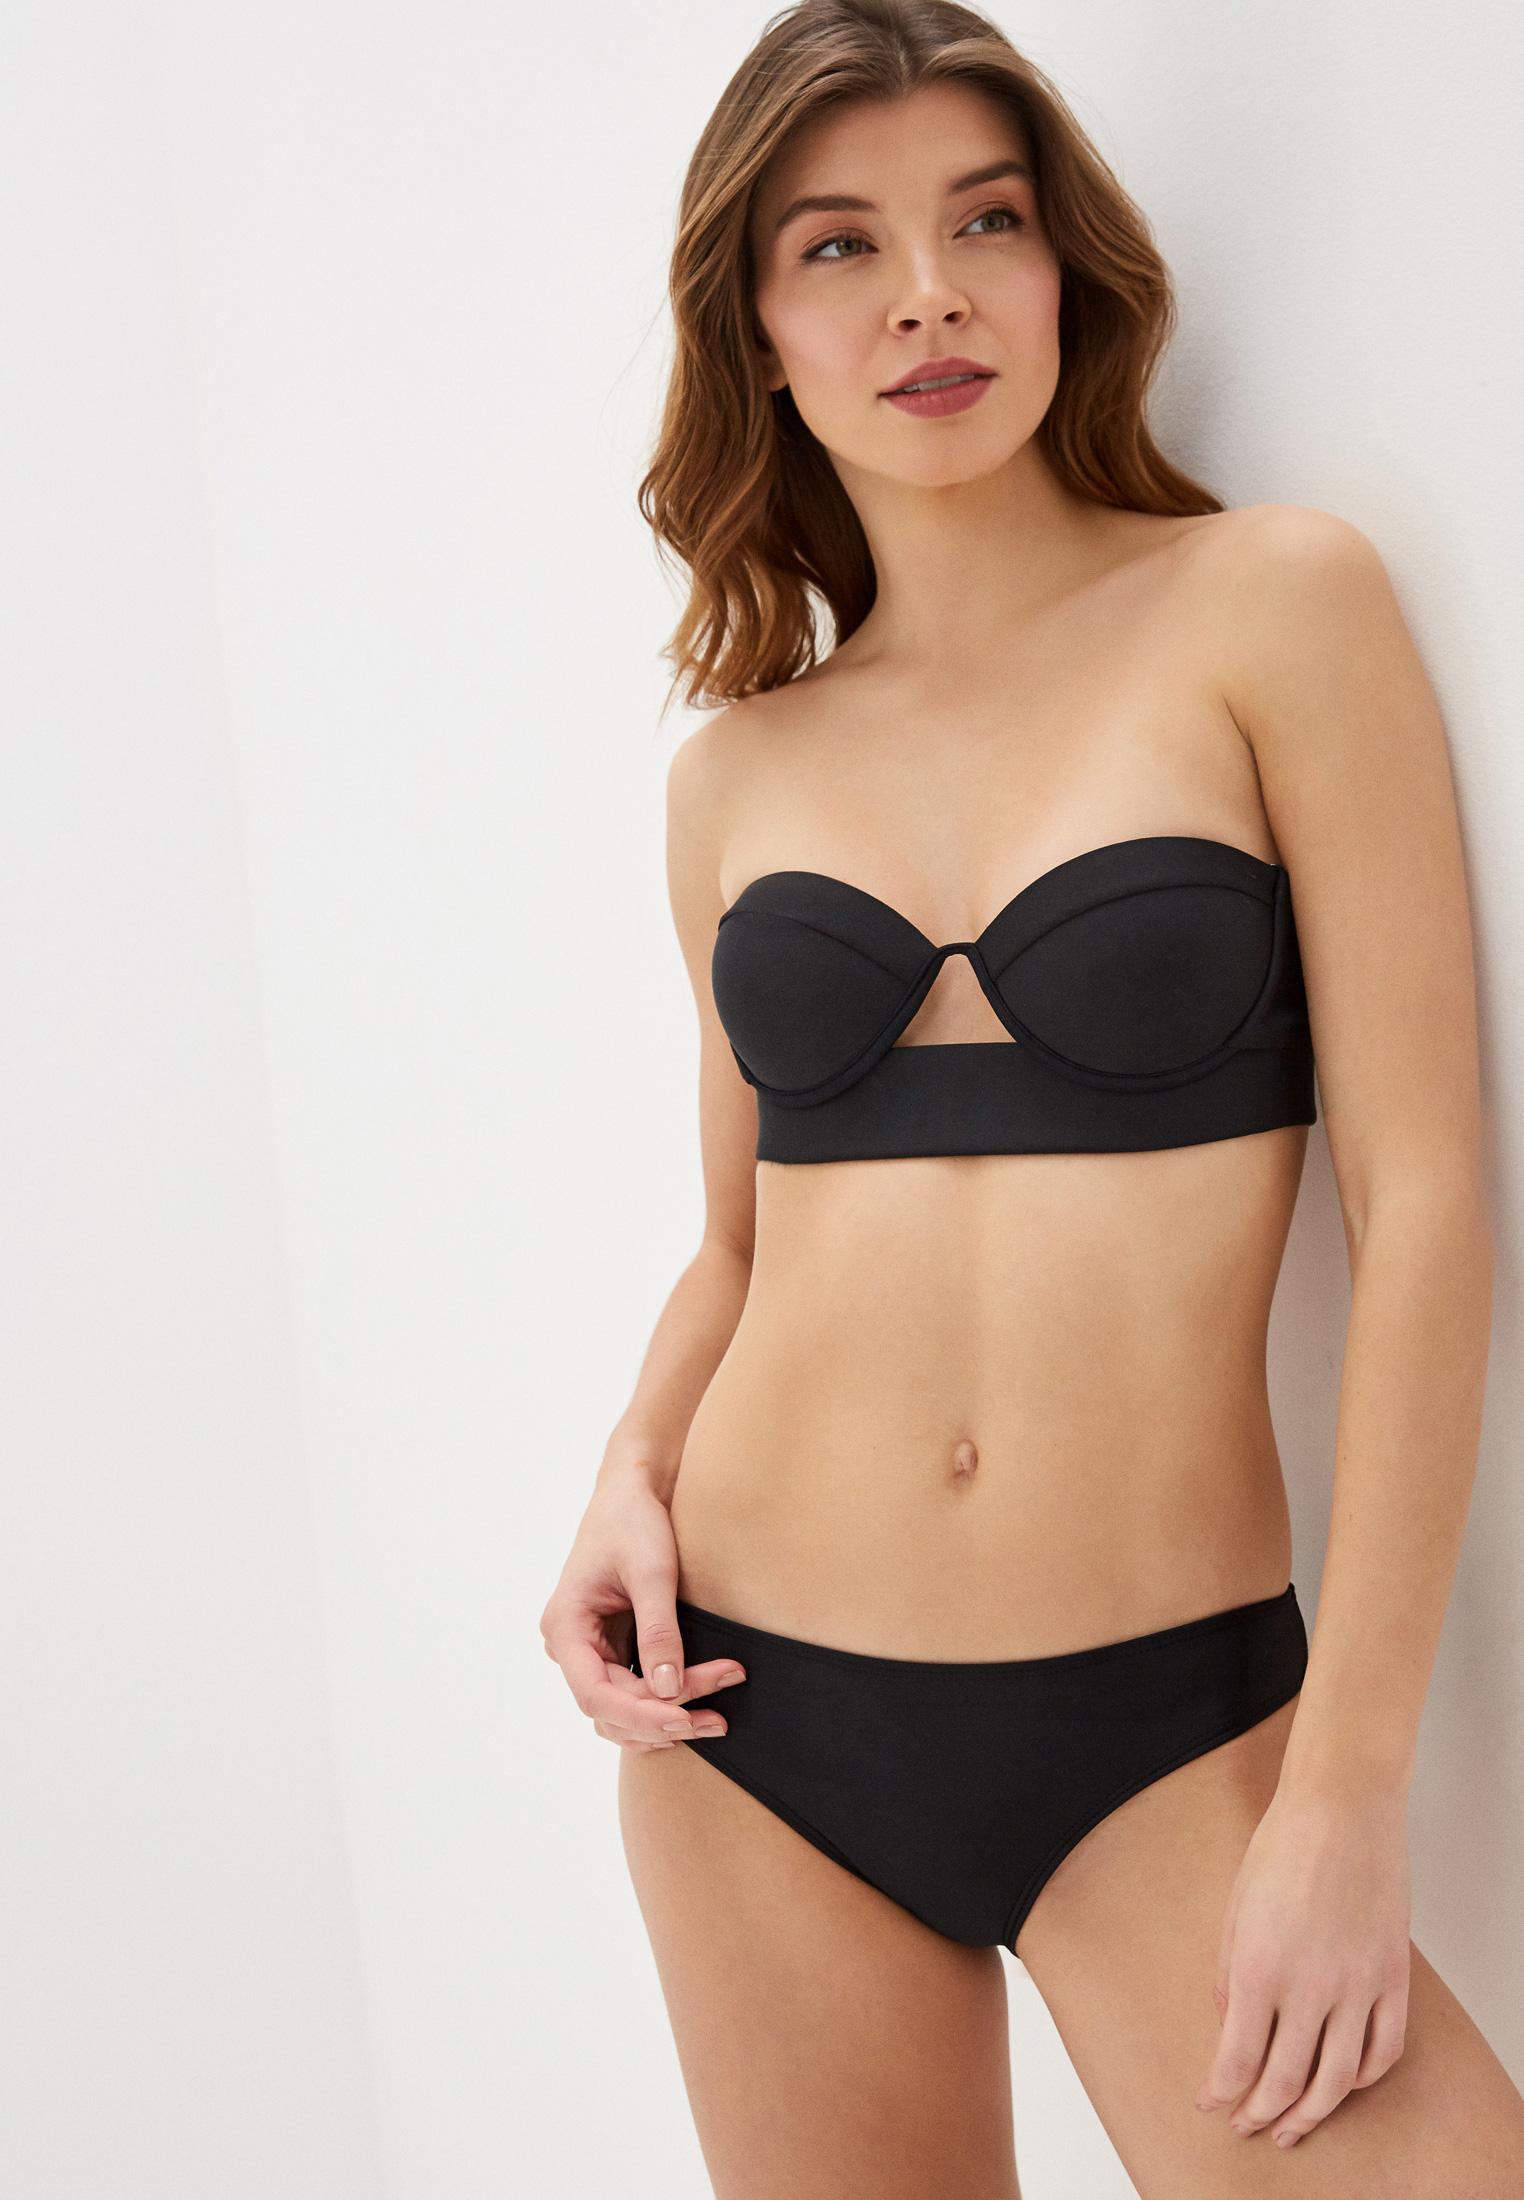 Donna Desigual Swimwear Bandeau Rem Woman Desigual Blue Bikini Top